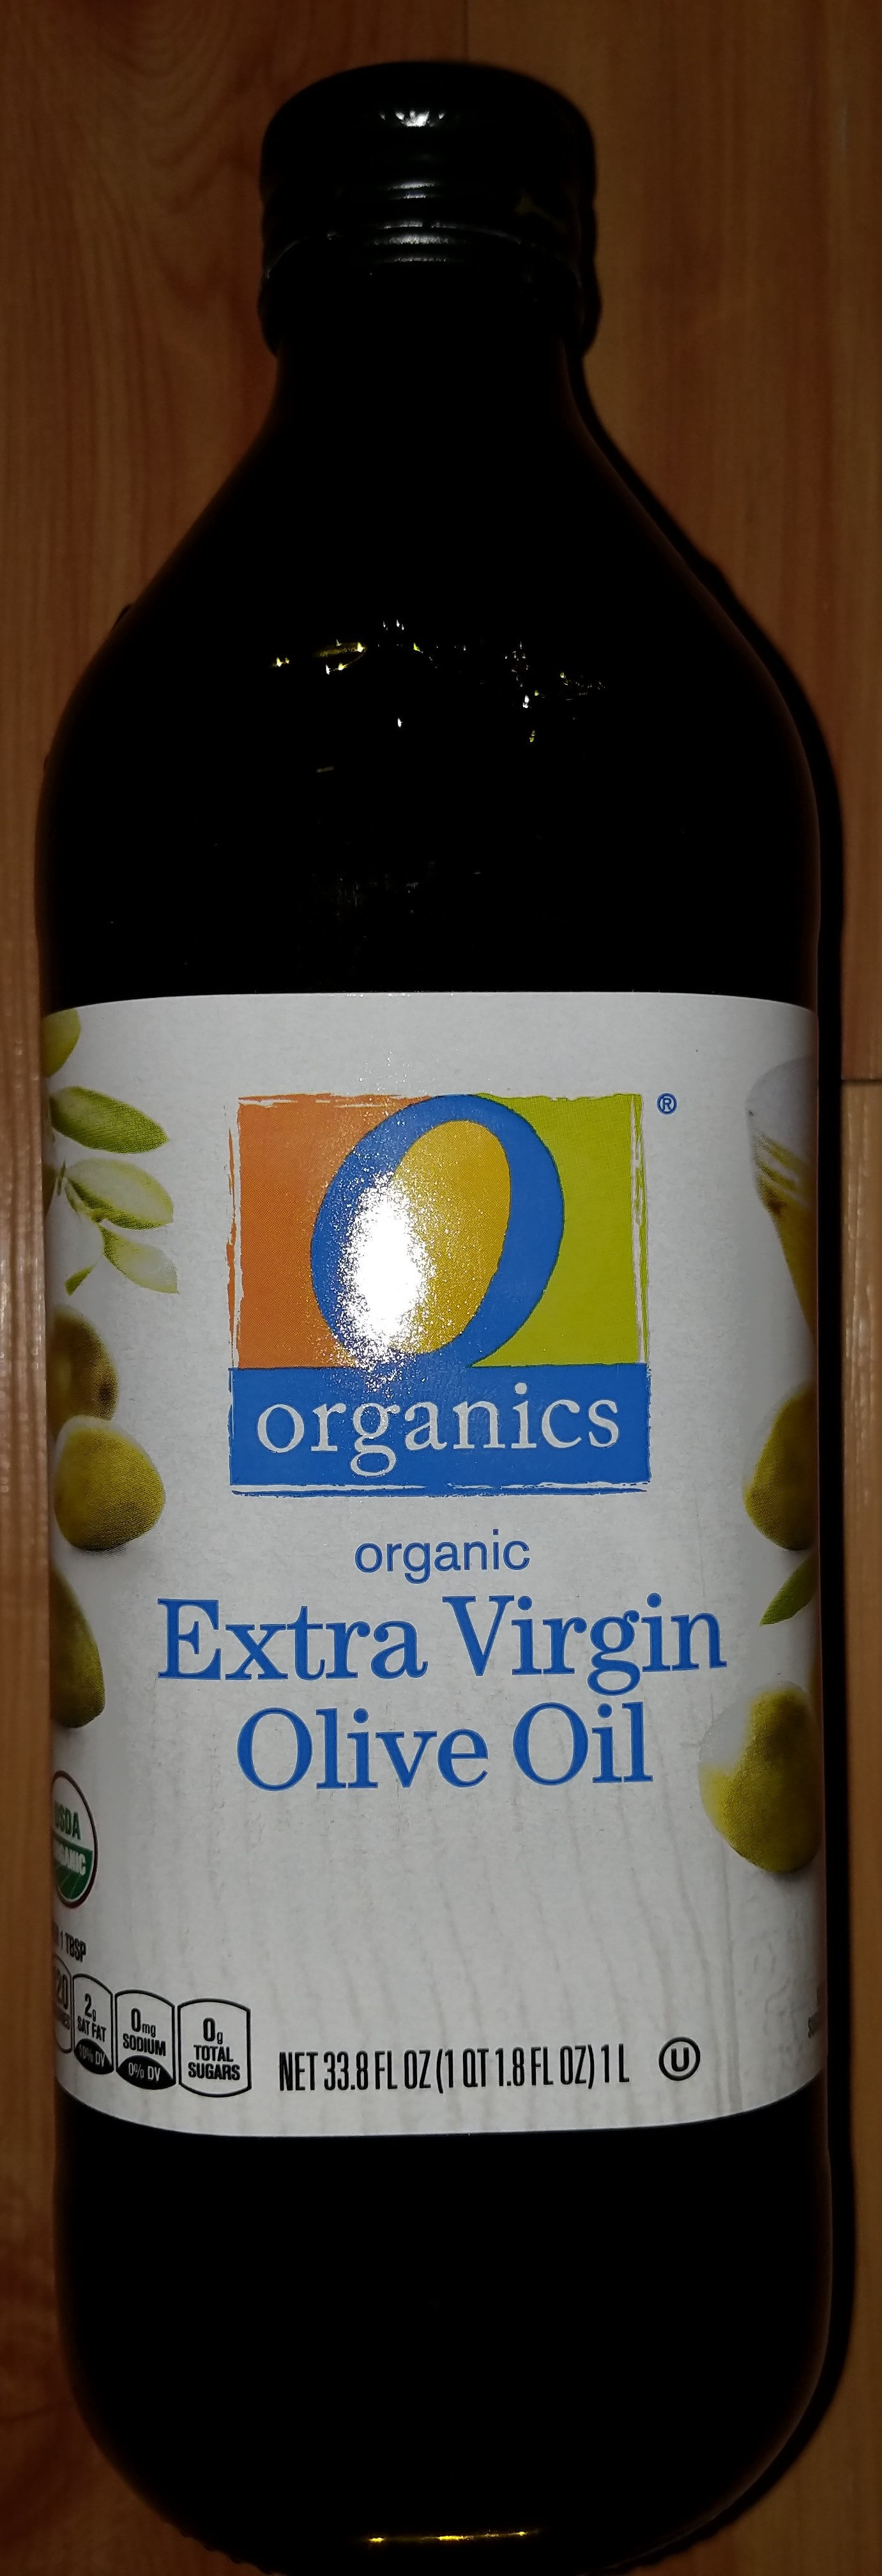 Organic extra virgin olive oil - Product - en